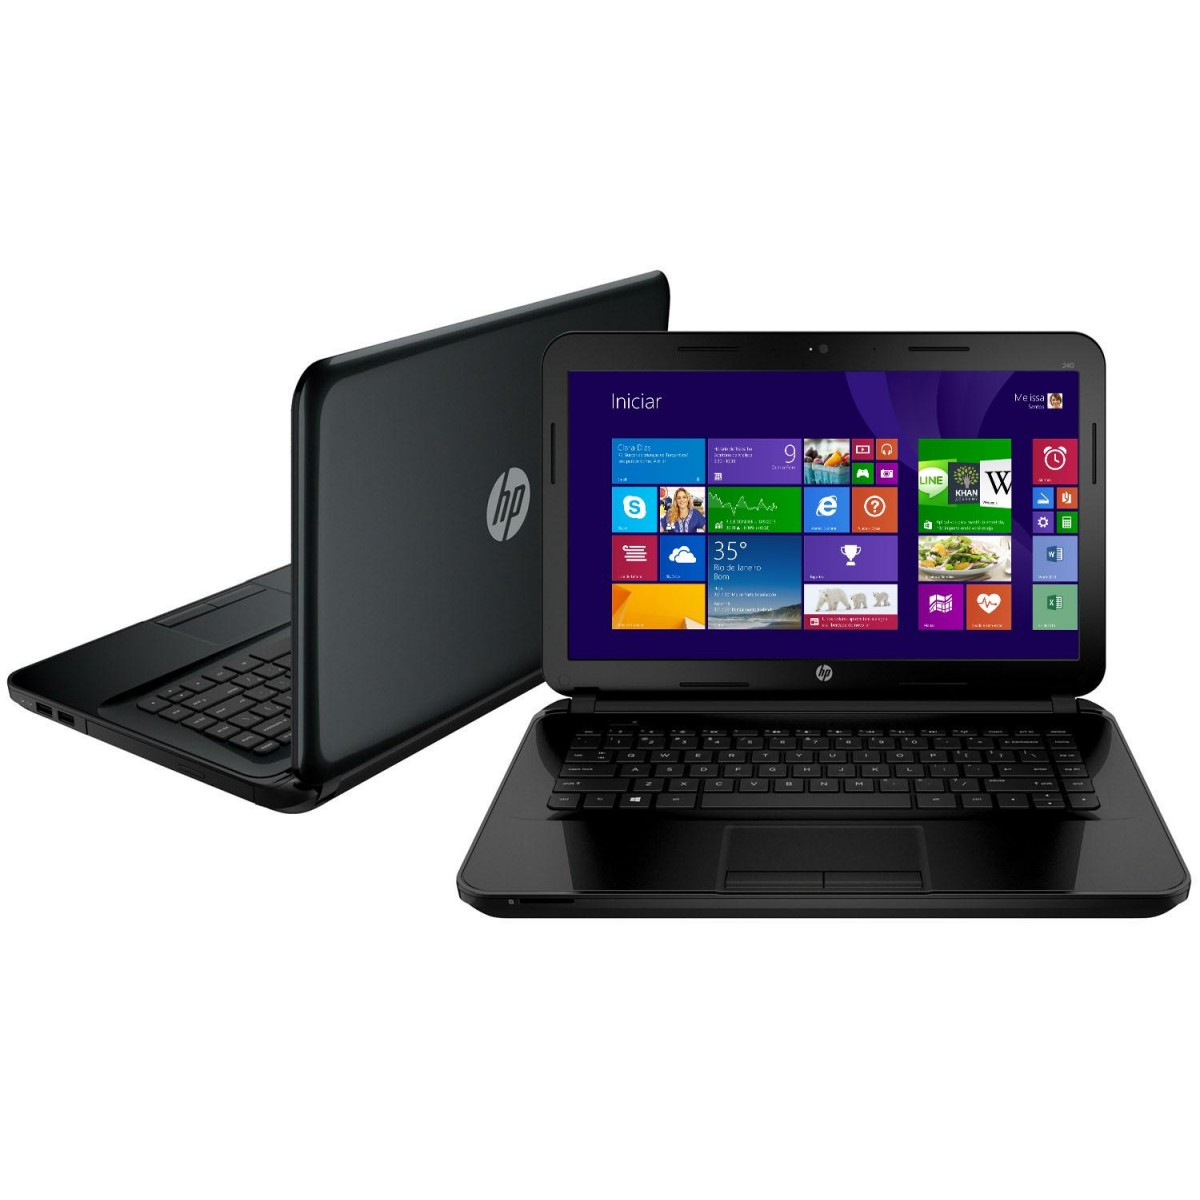 Notebook 14-d030br com Intel Core i5 4GB 500GB LED 14 Windows 8 - HP